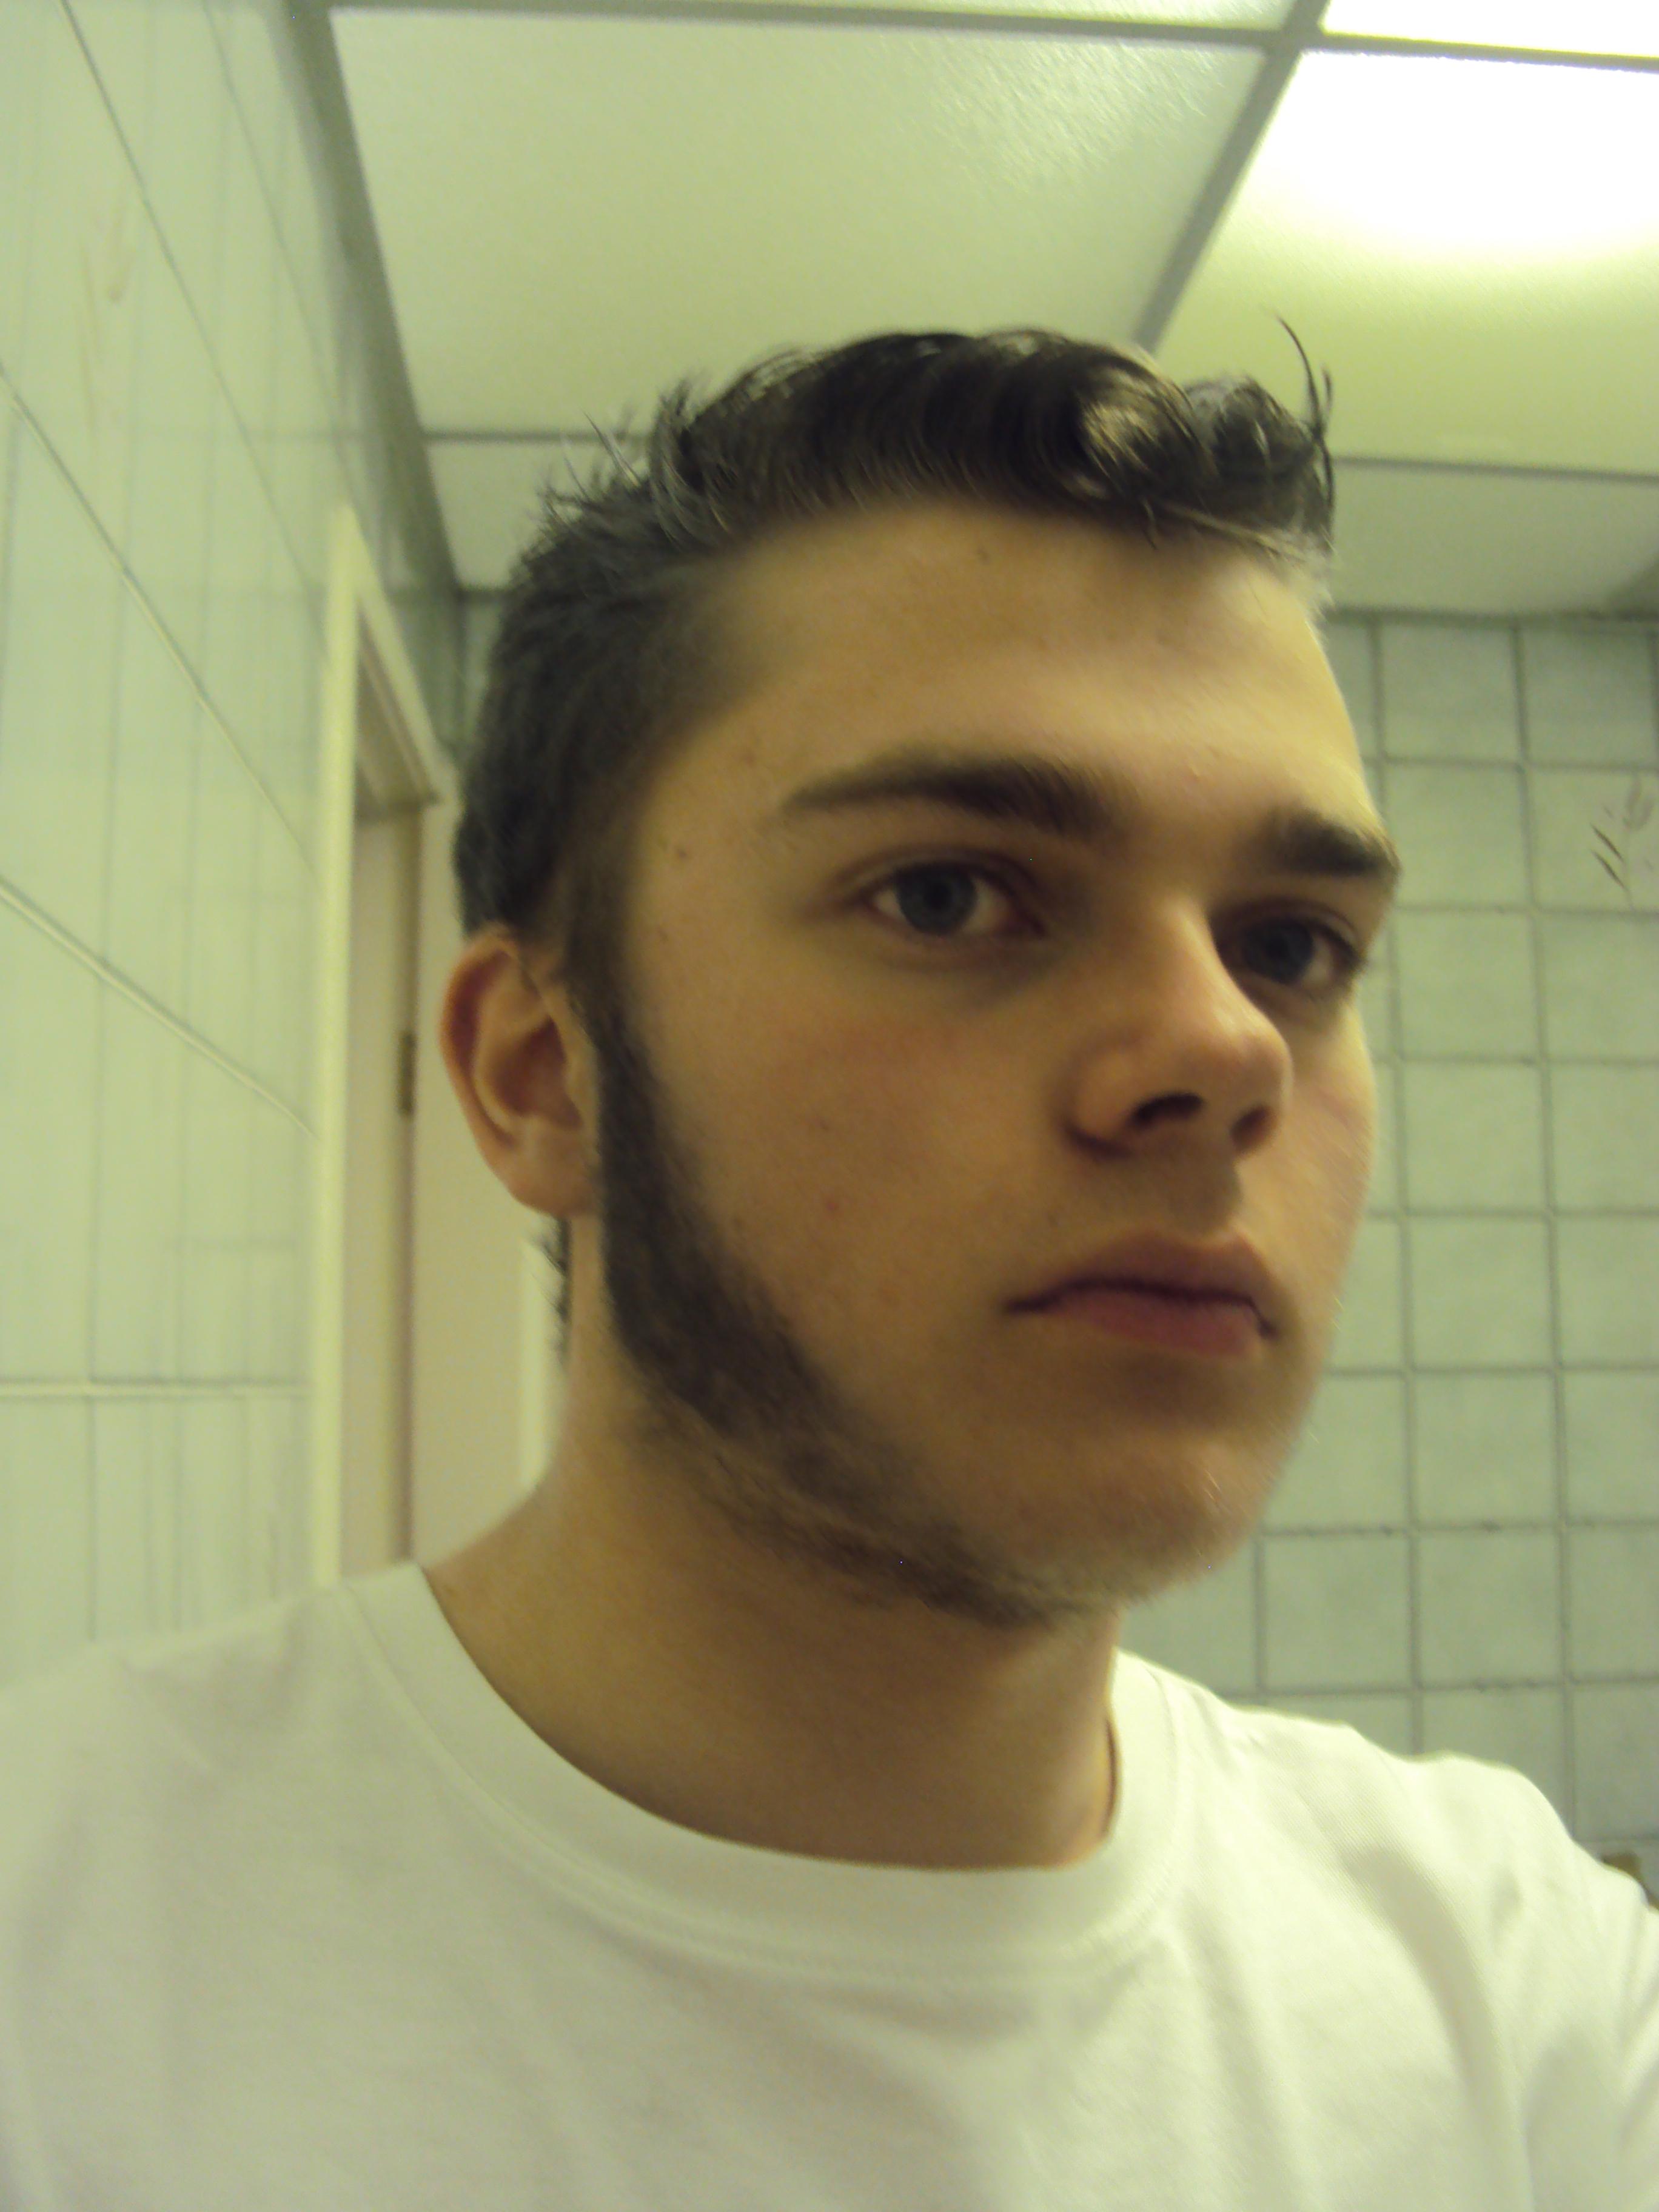 Wolverine Facial Hair by MadMatt1995